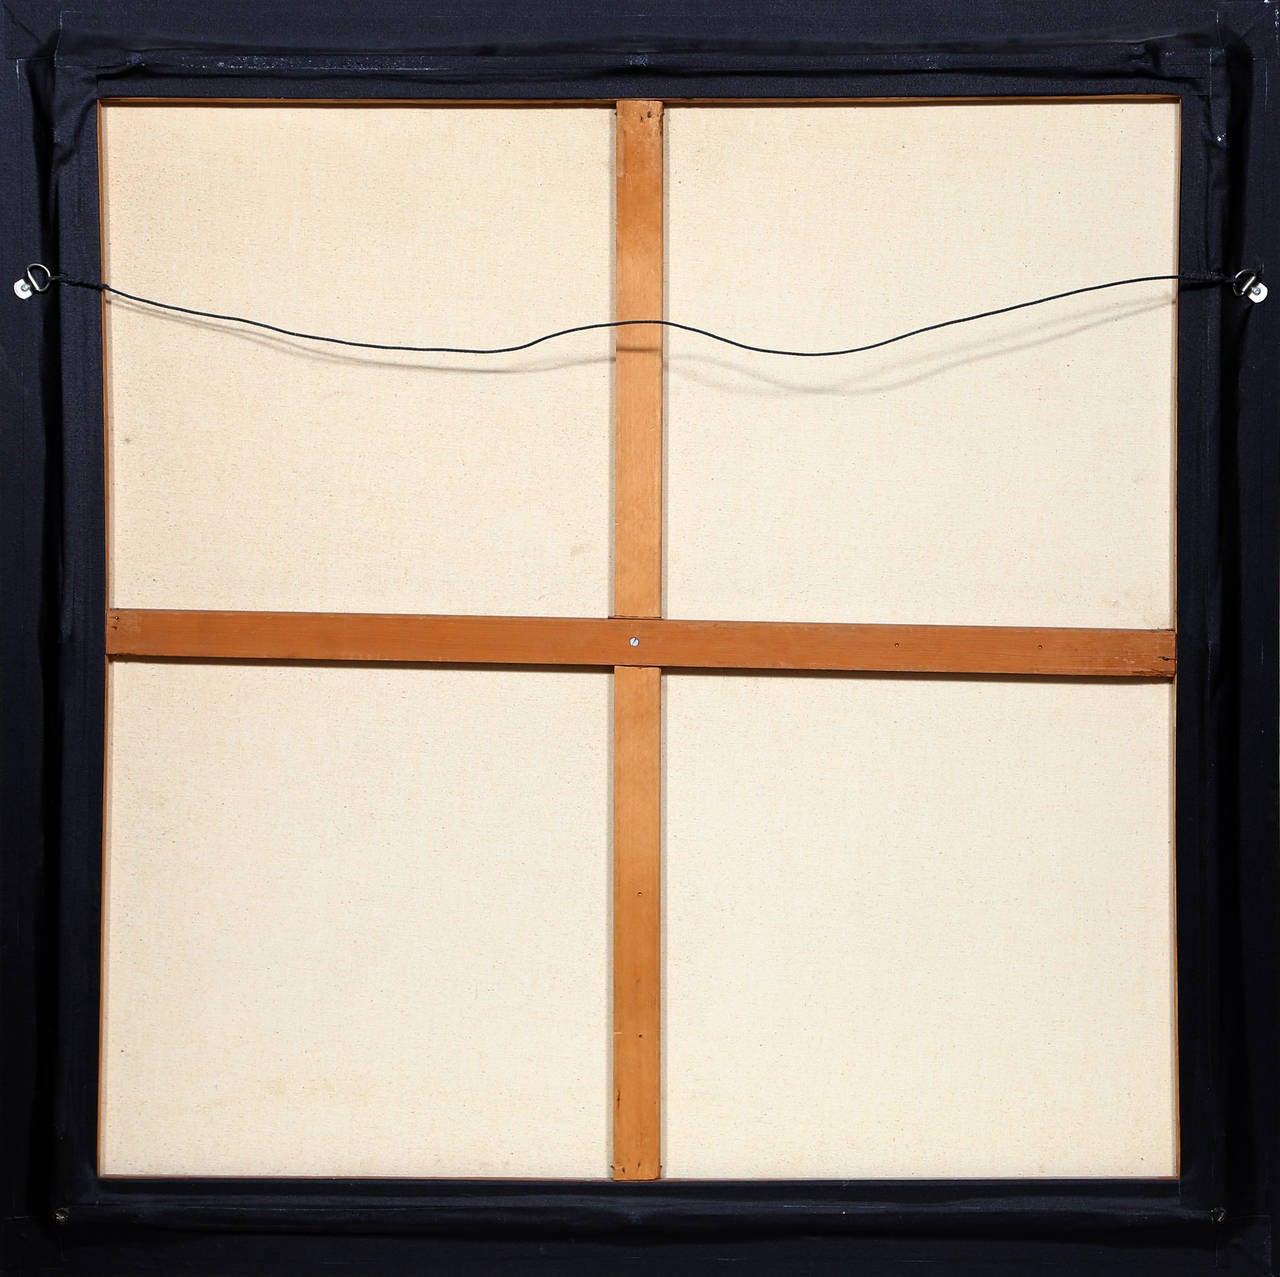 Fuschia - Brown Still-Life Painting by Jan Peter Tripp